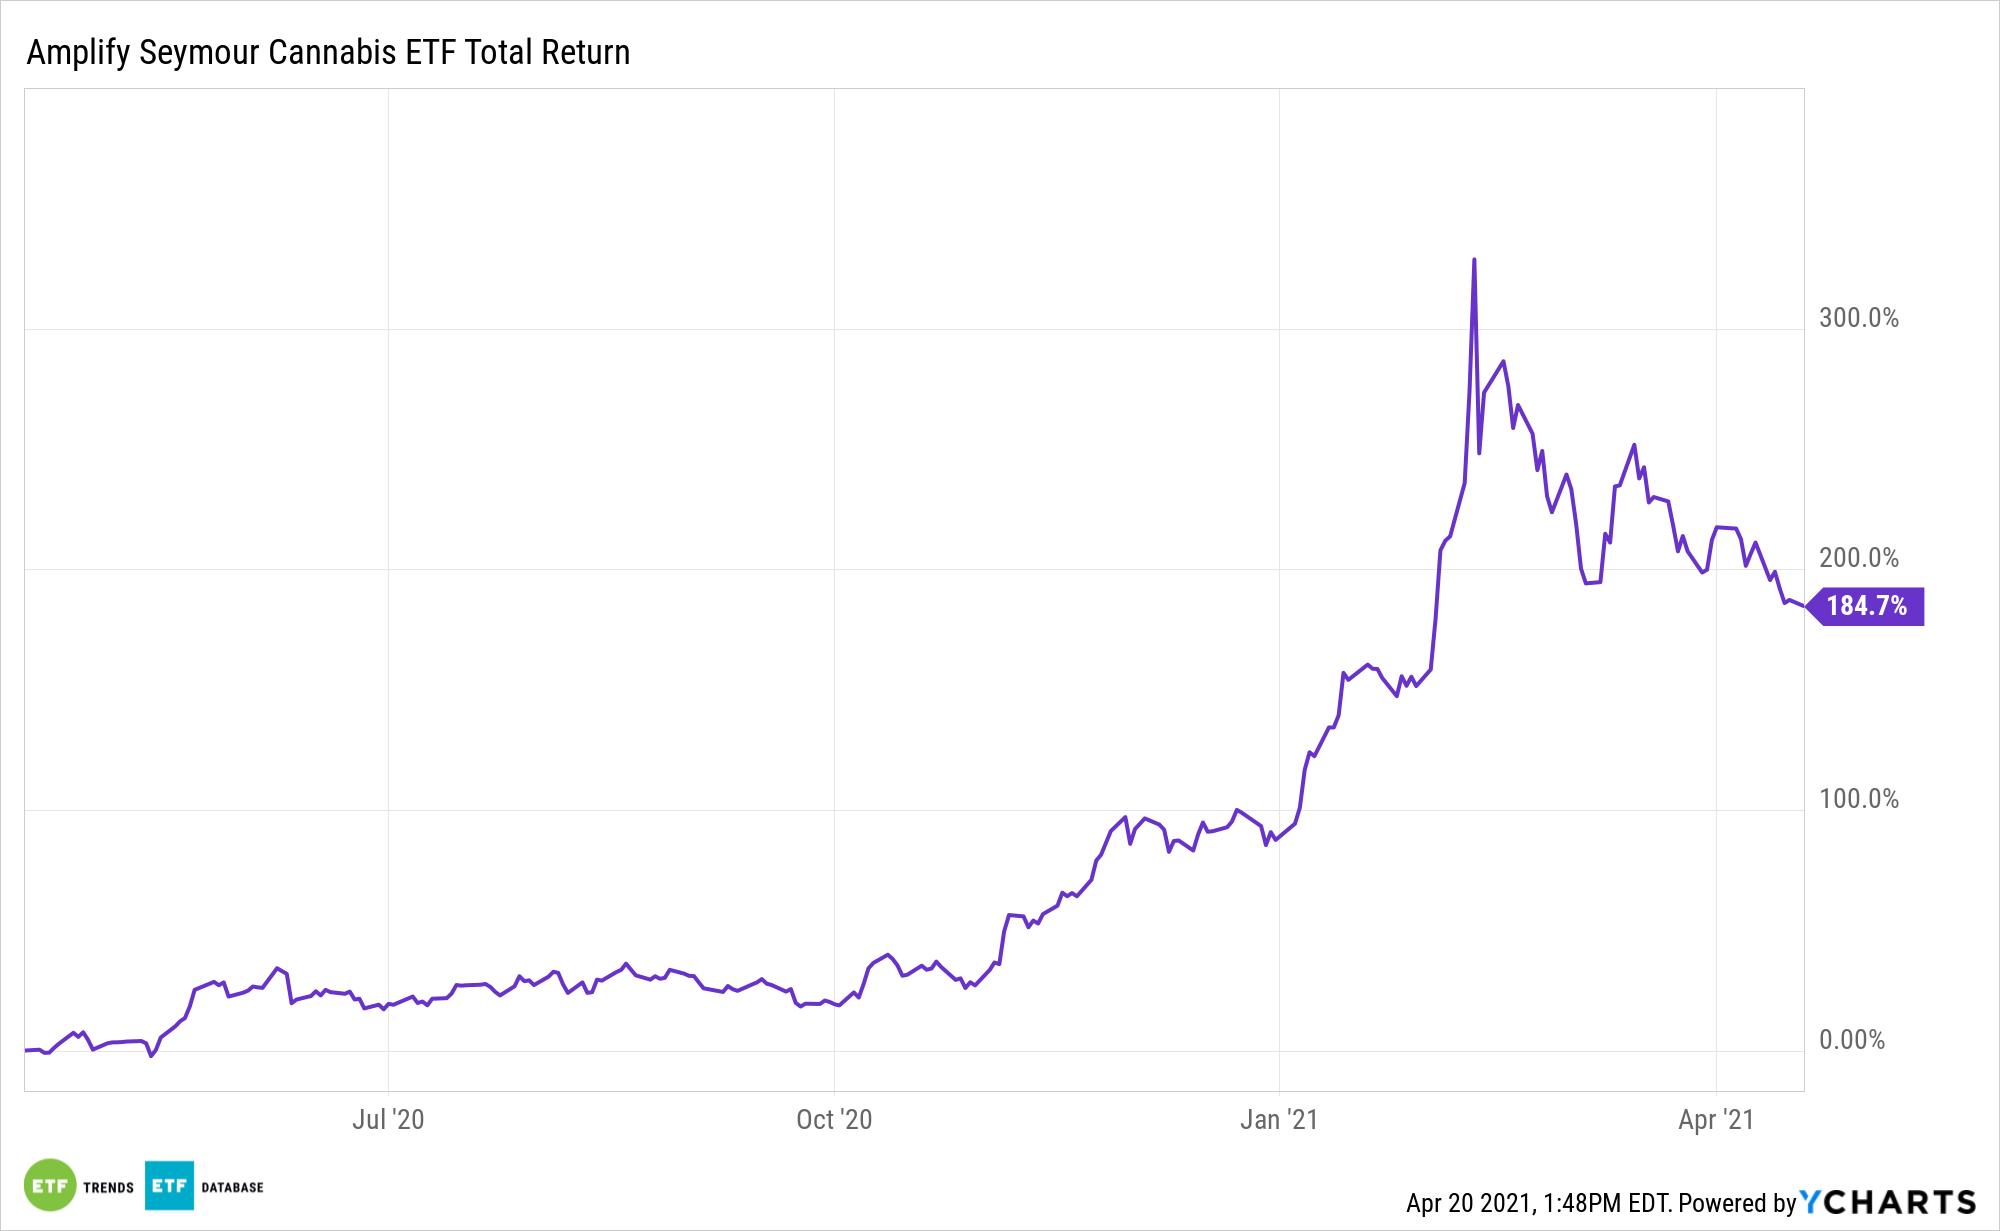 CNBS 1 Year Total Return